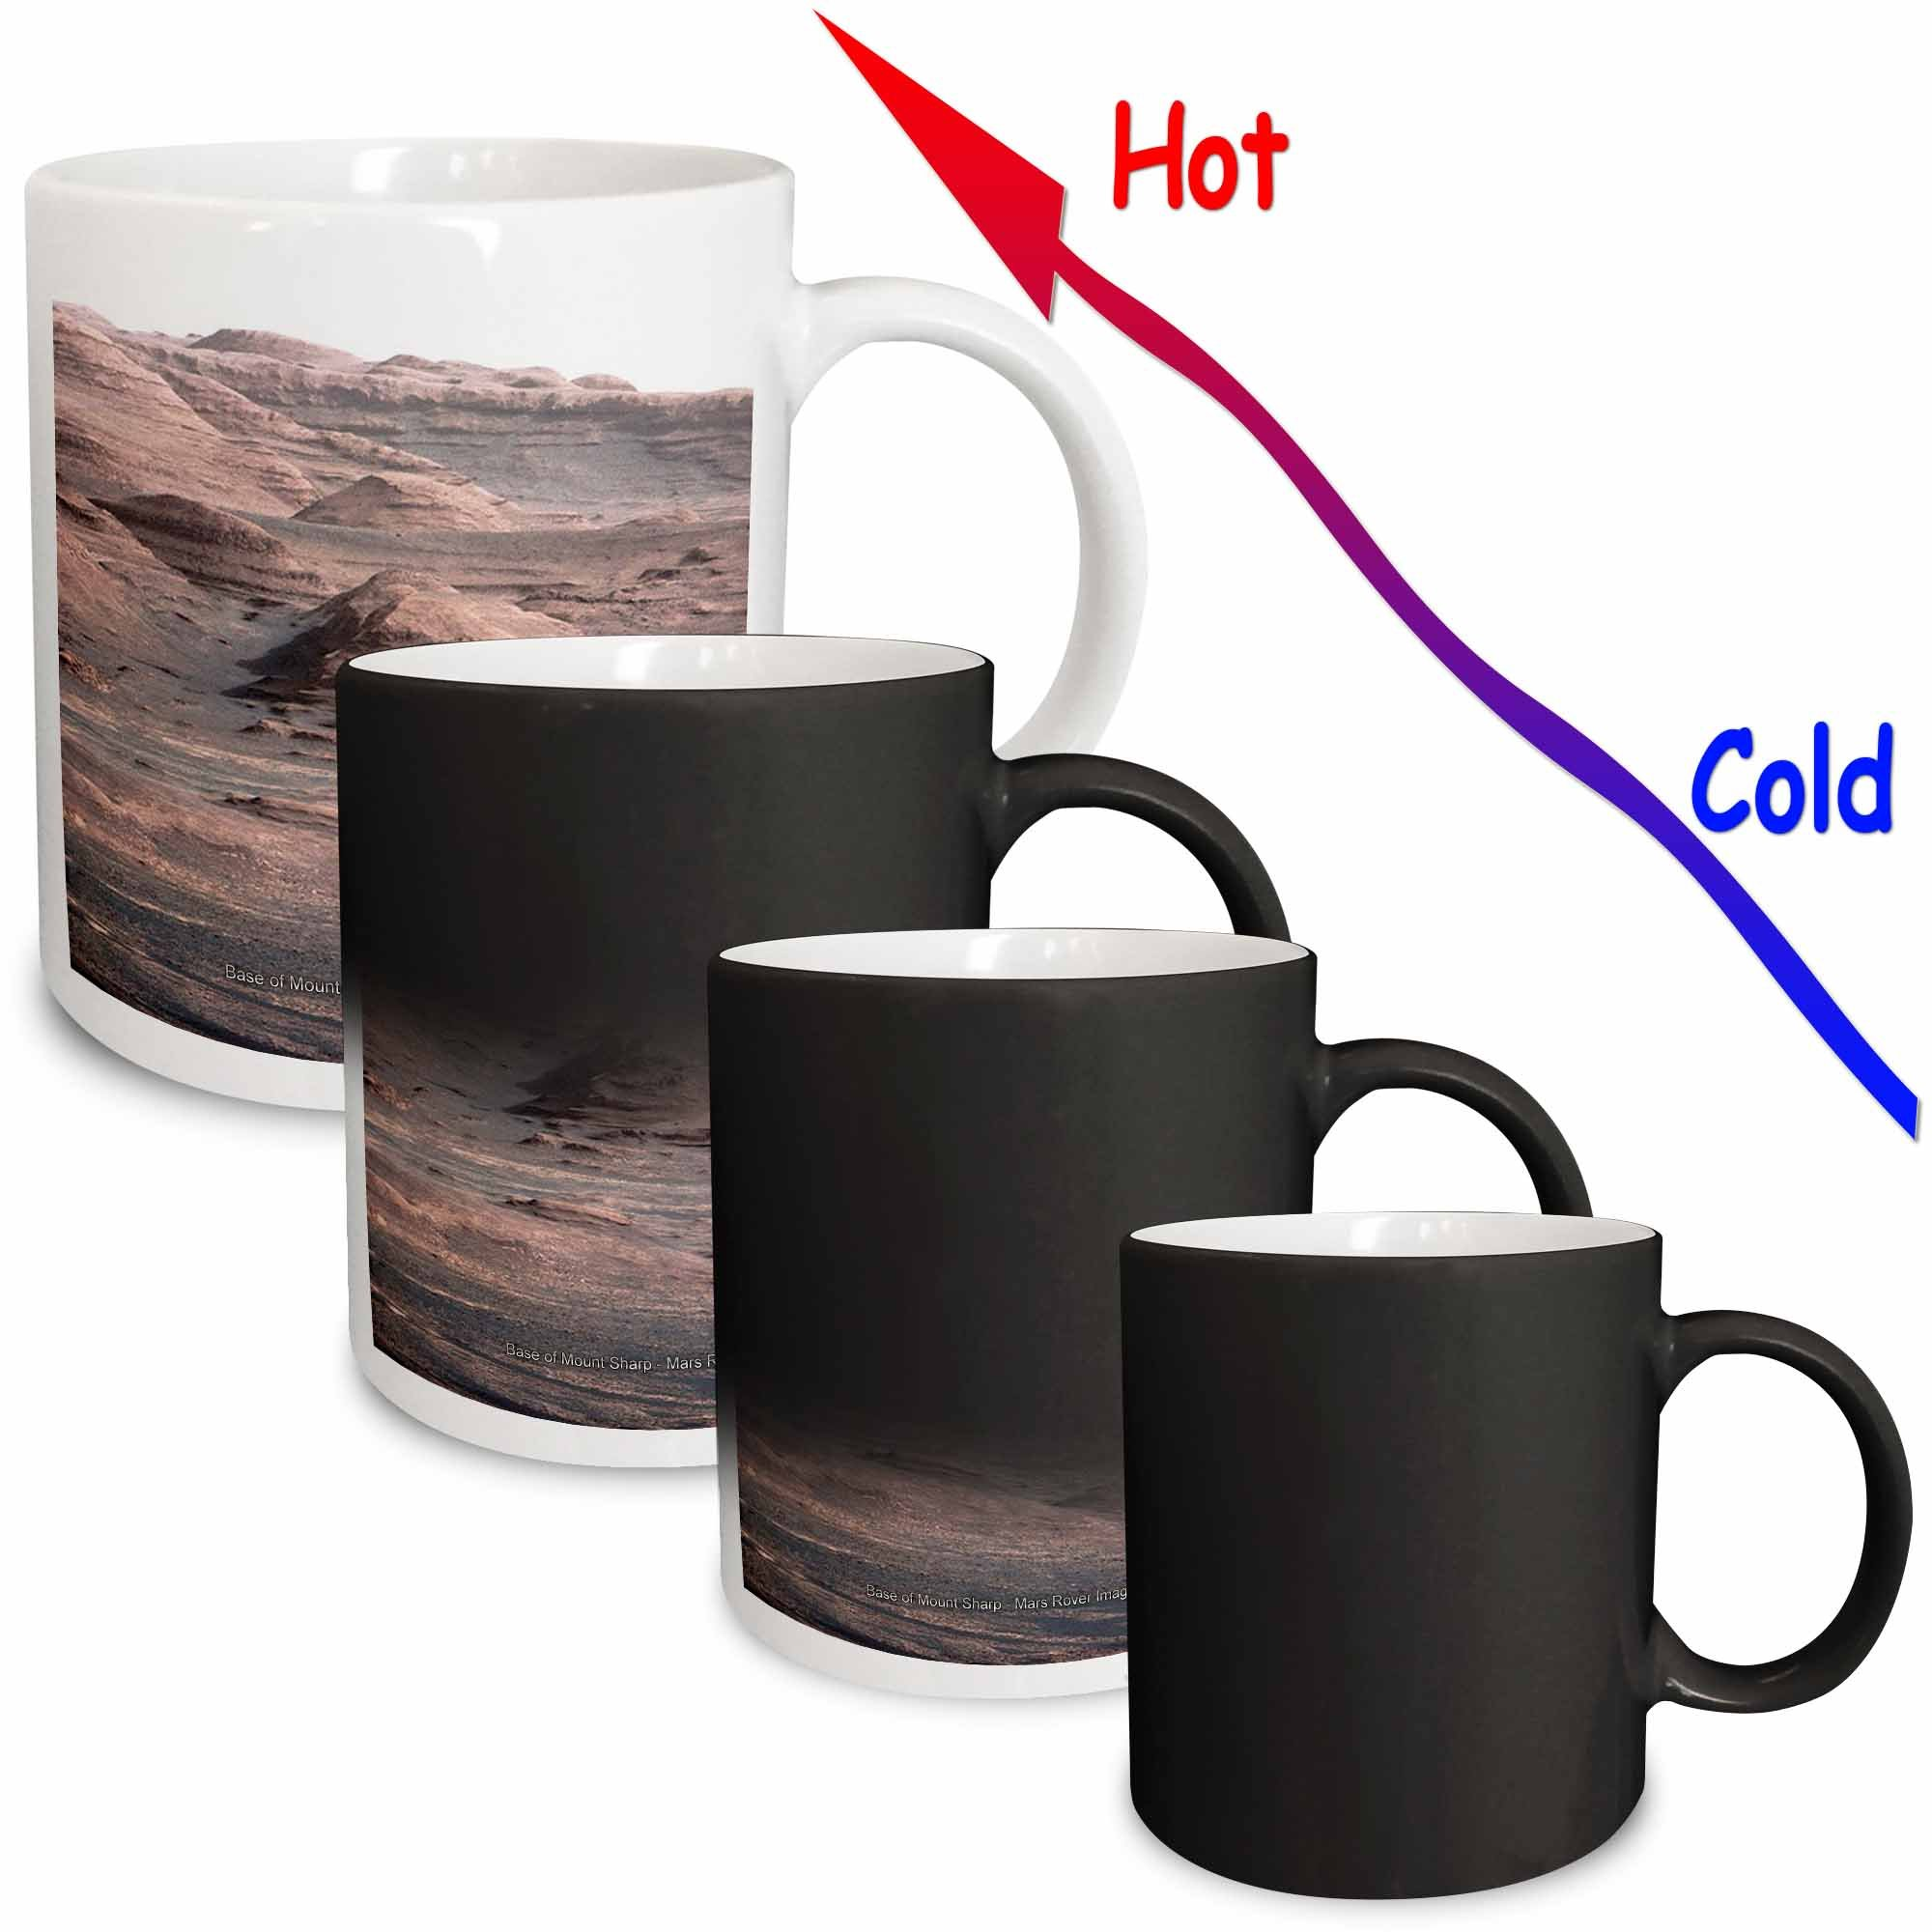 3dRose mug_76835_3 Solar System Base of Mount Sharp Mars Rover Image Magic Transforming Mug, 11-Ounce